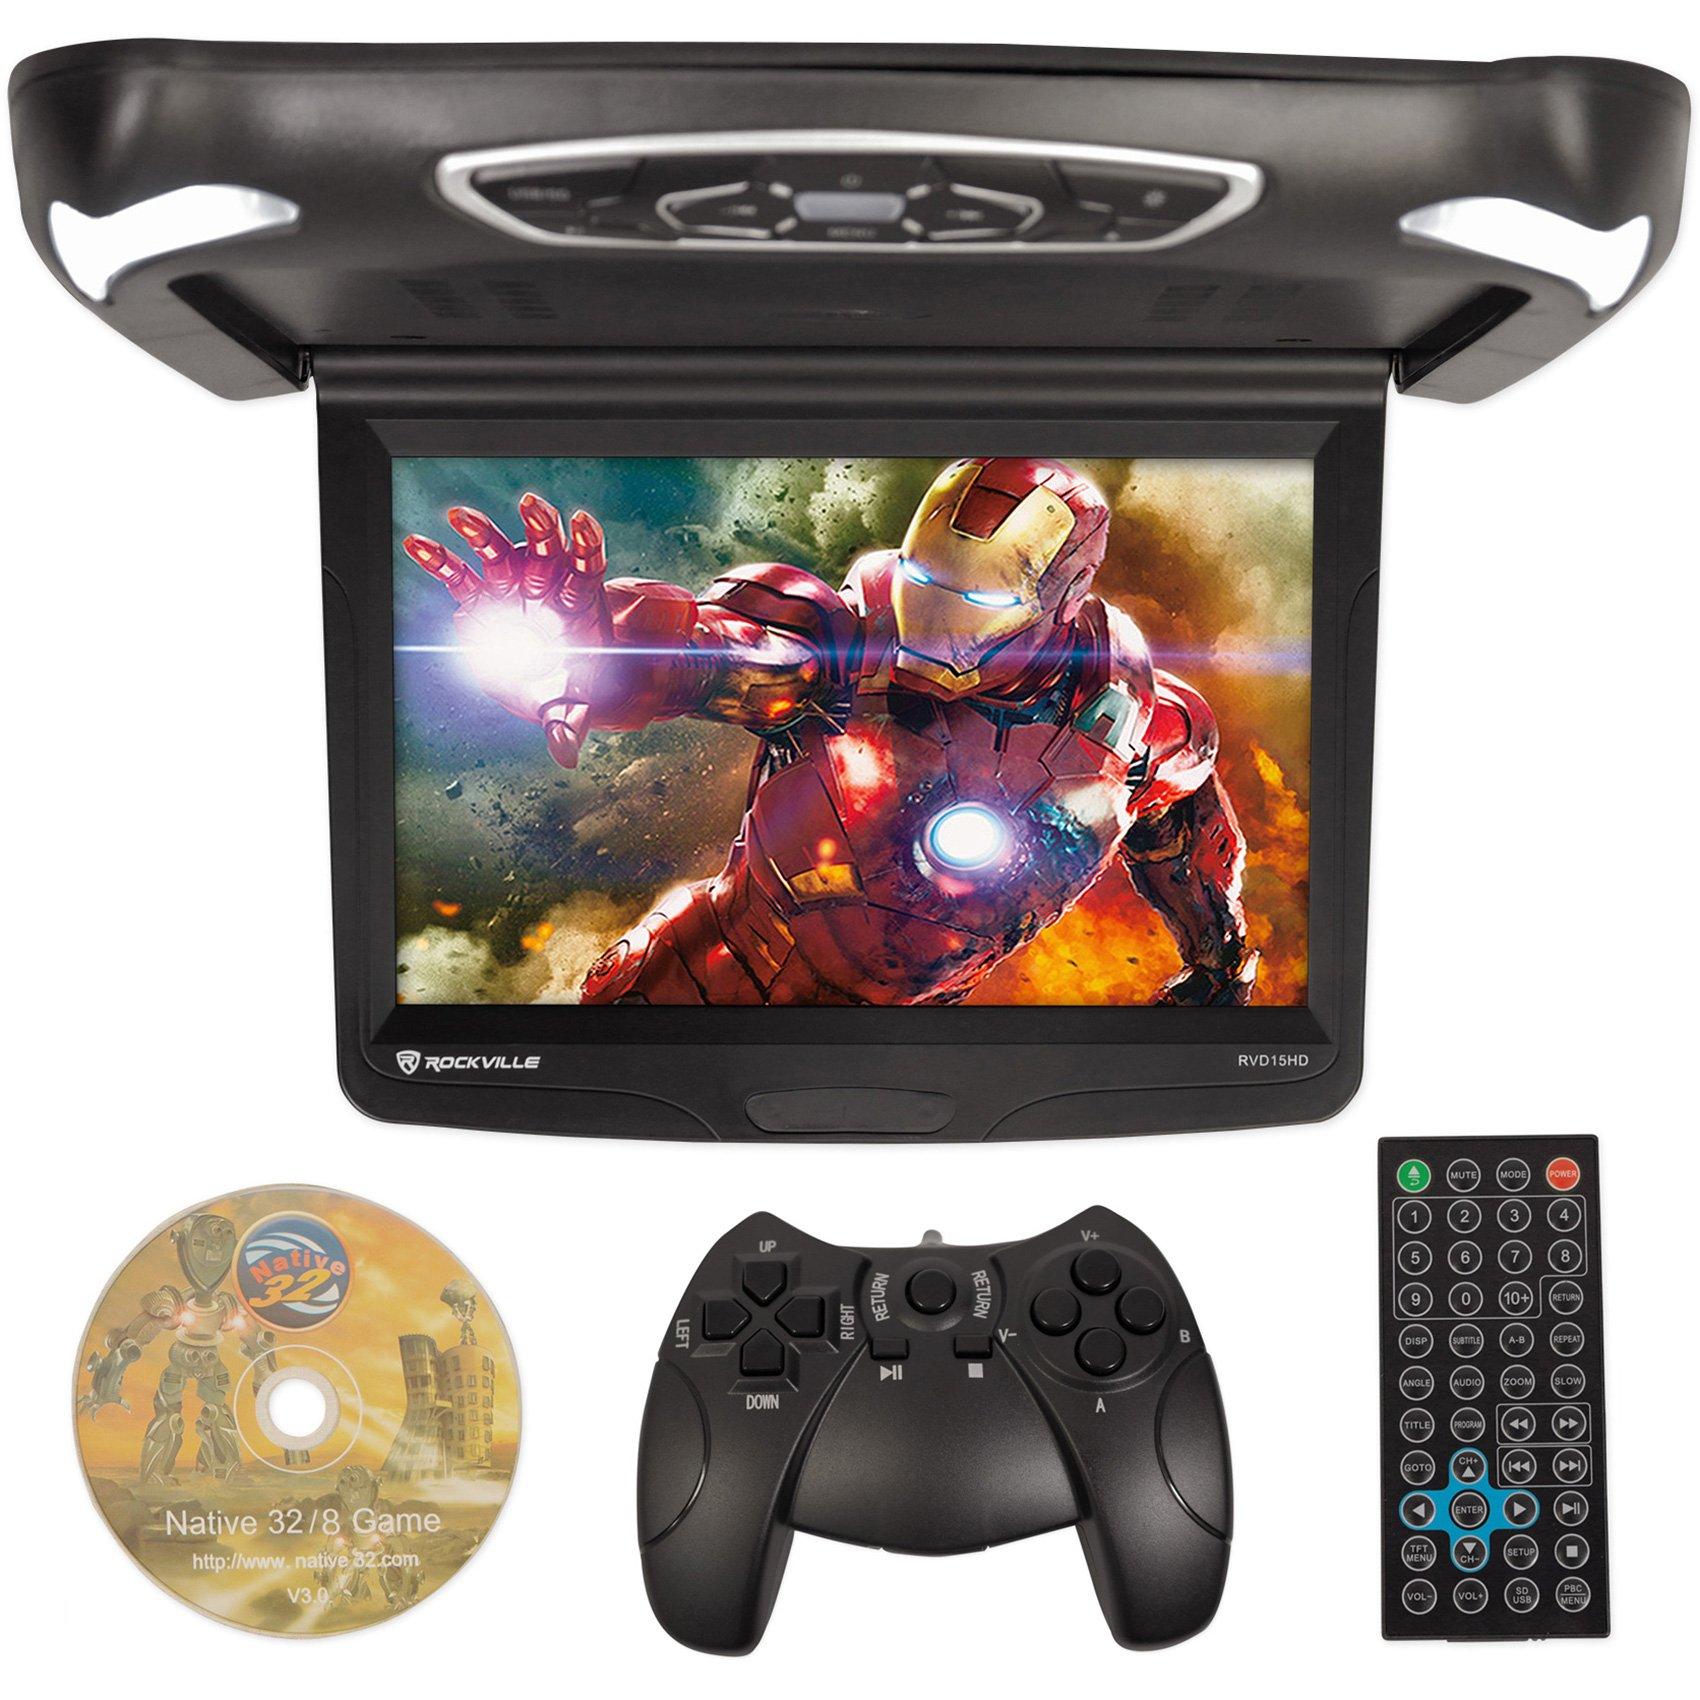 Rockville RVD15BGB Black/Grey/Tan 15'' Flip Down Car Monitor w DVD/HDMI/Games/USB by Rockville